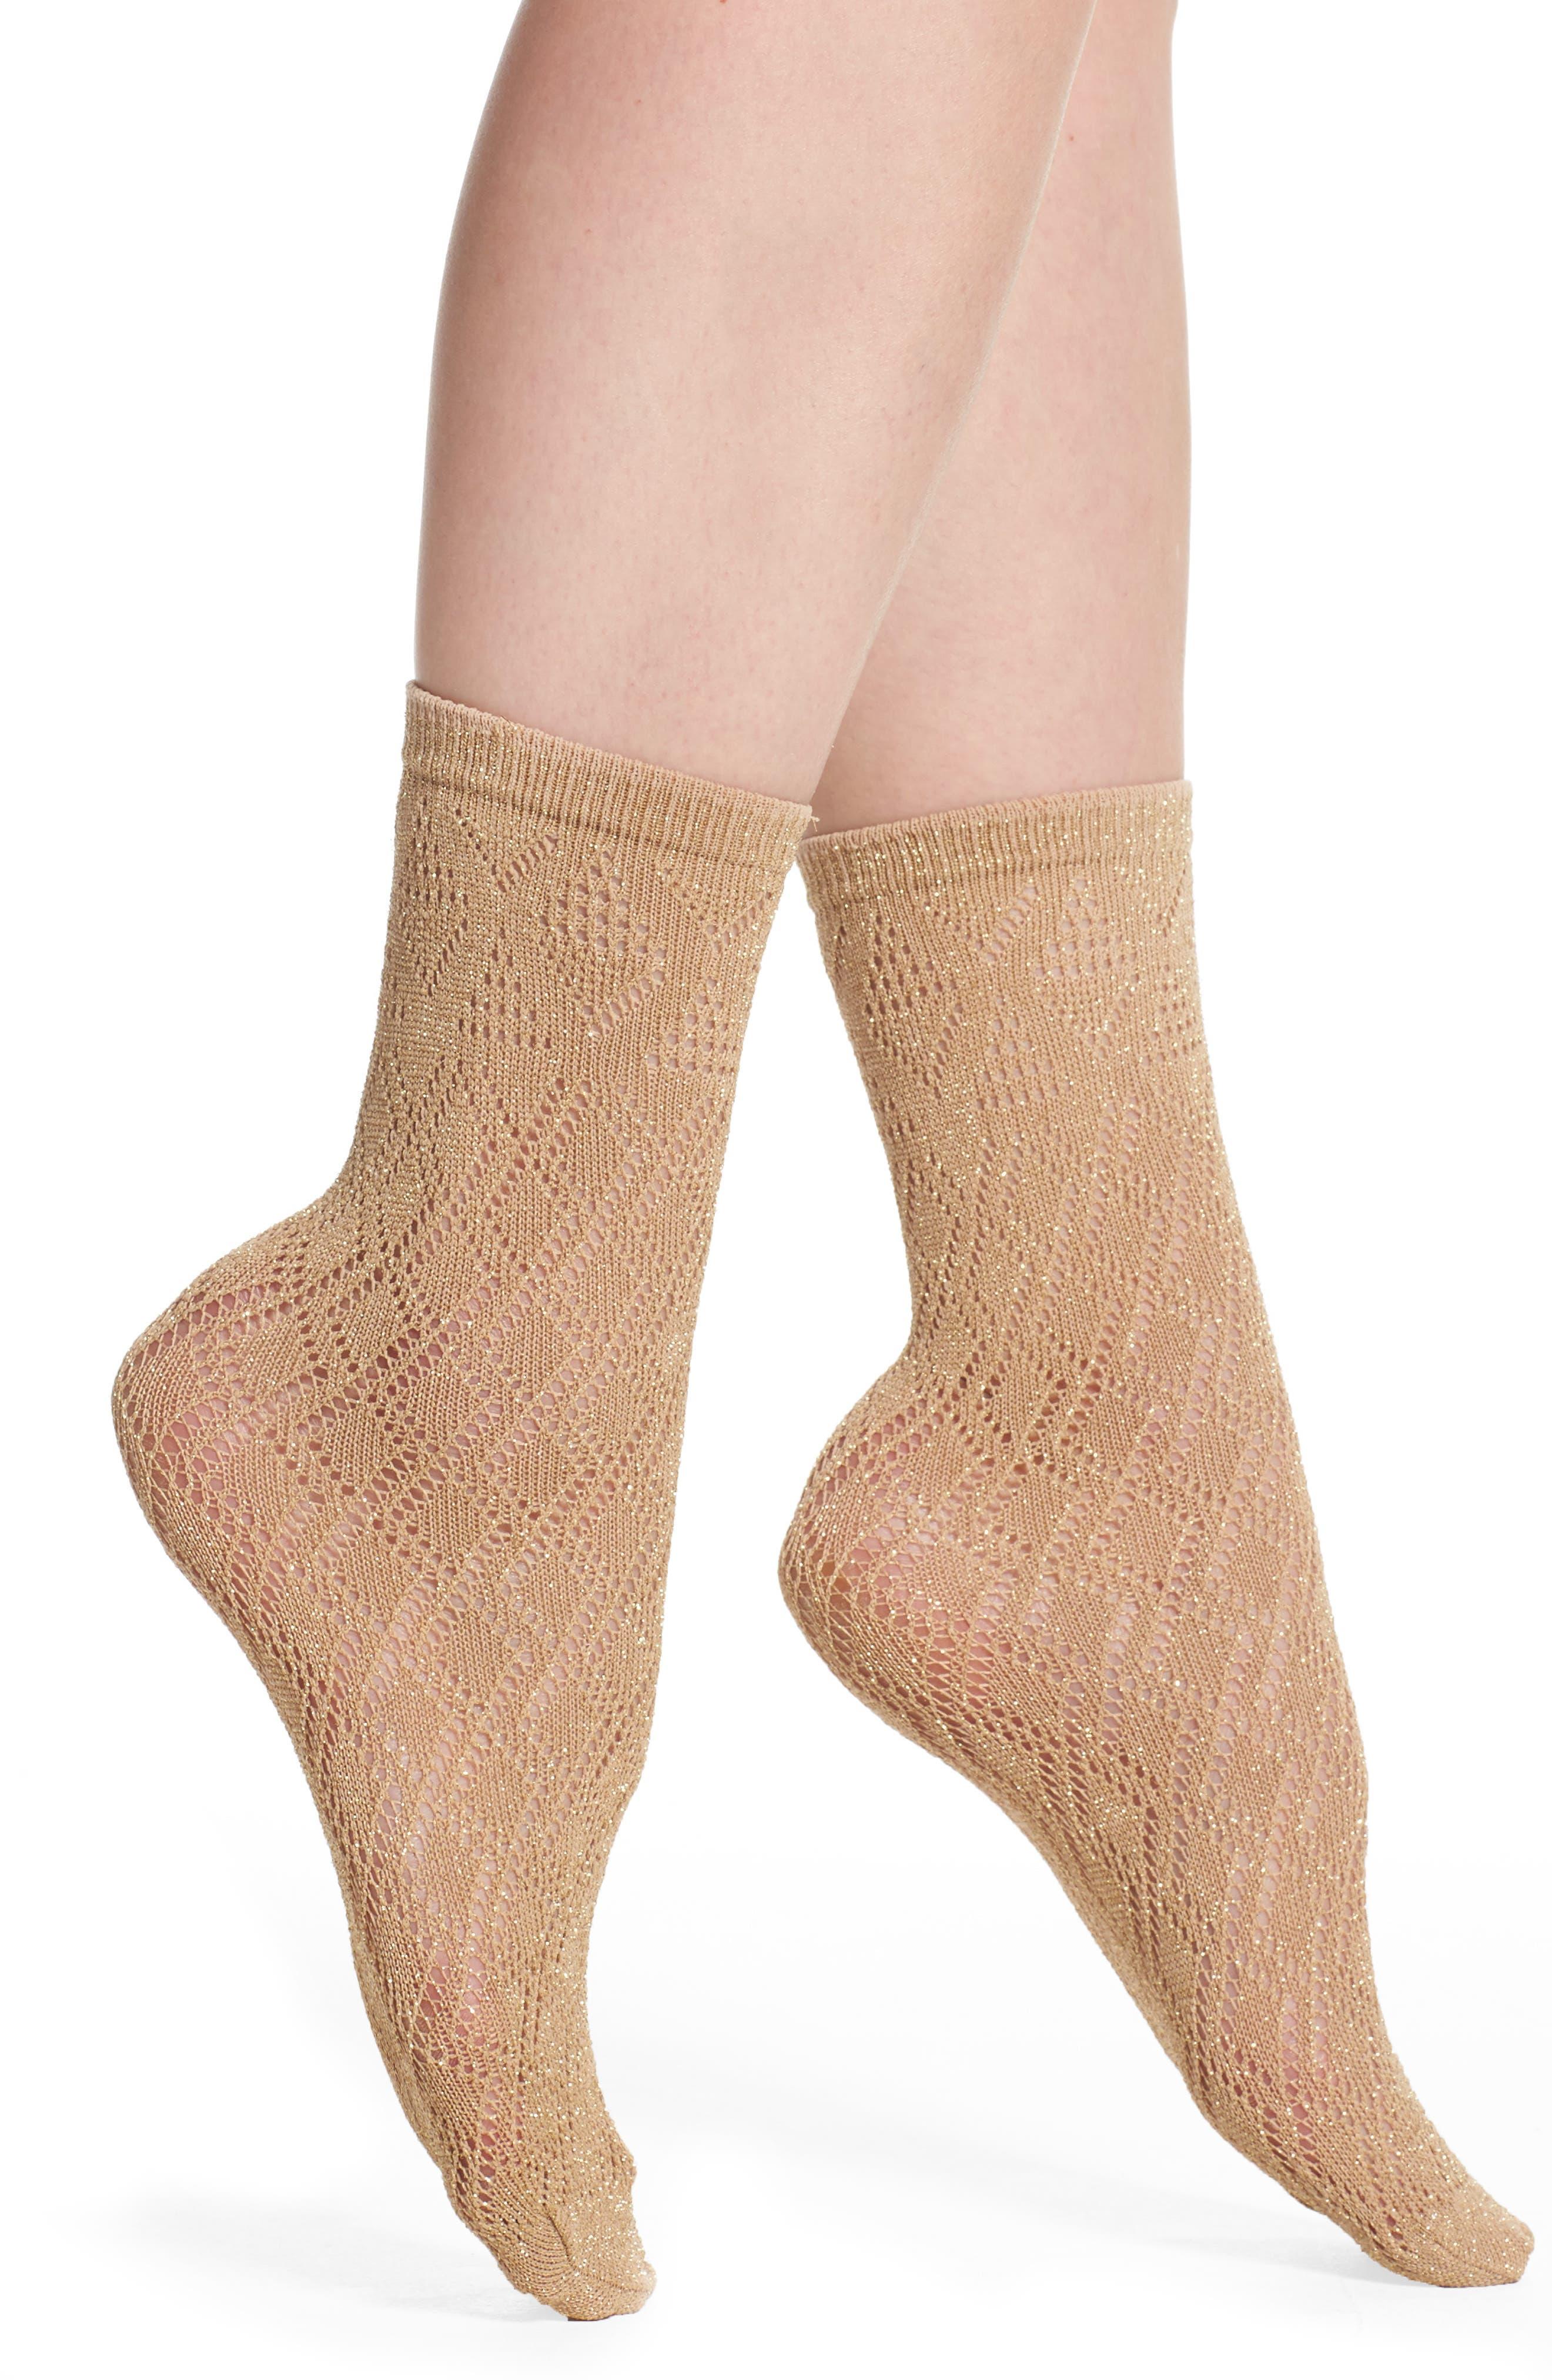 Alternate Image 1 Selected - Oroblu Kathy Trouser Socks